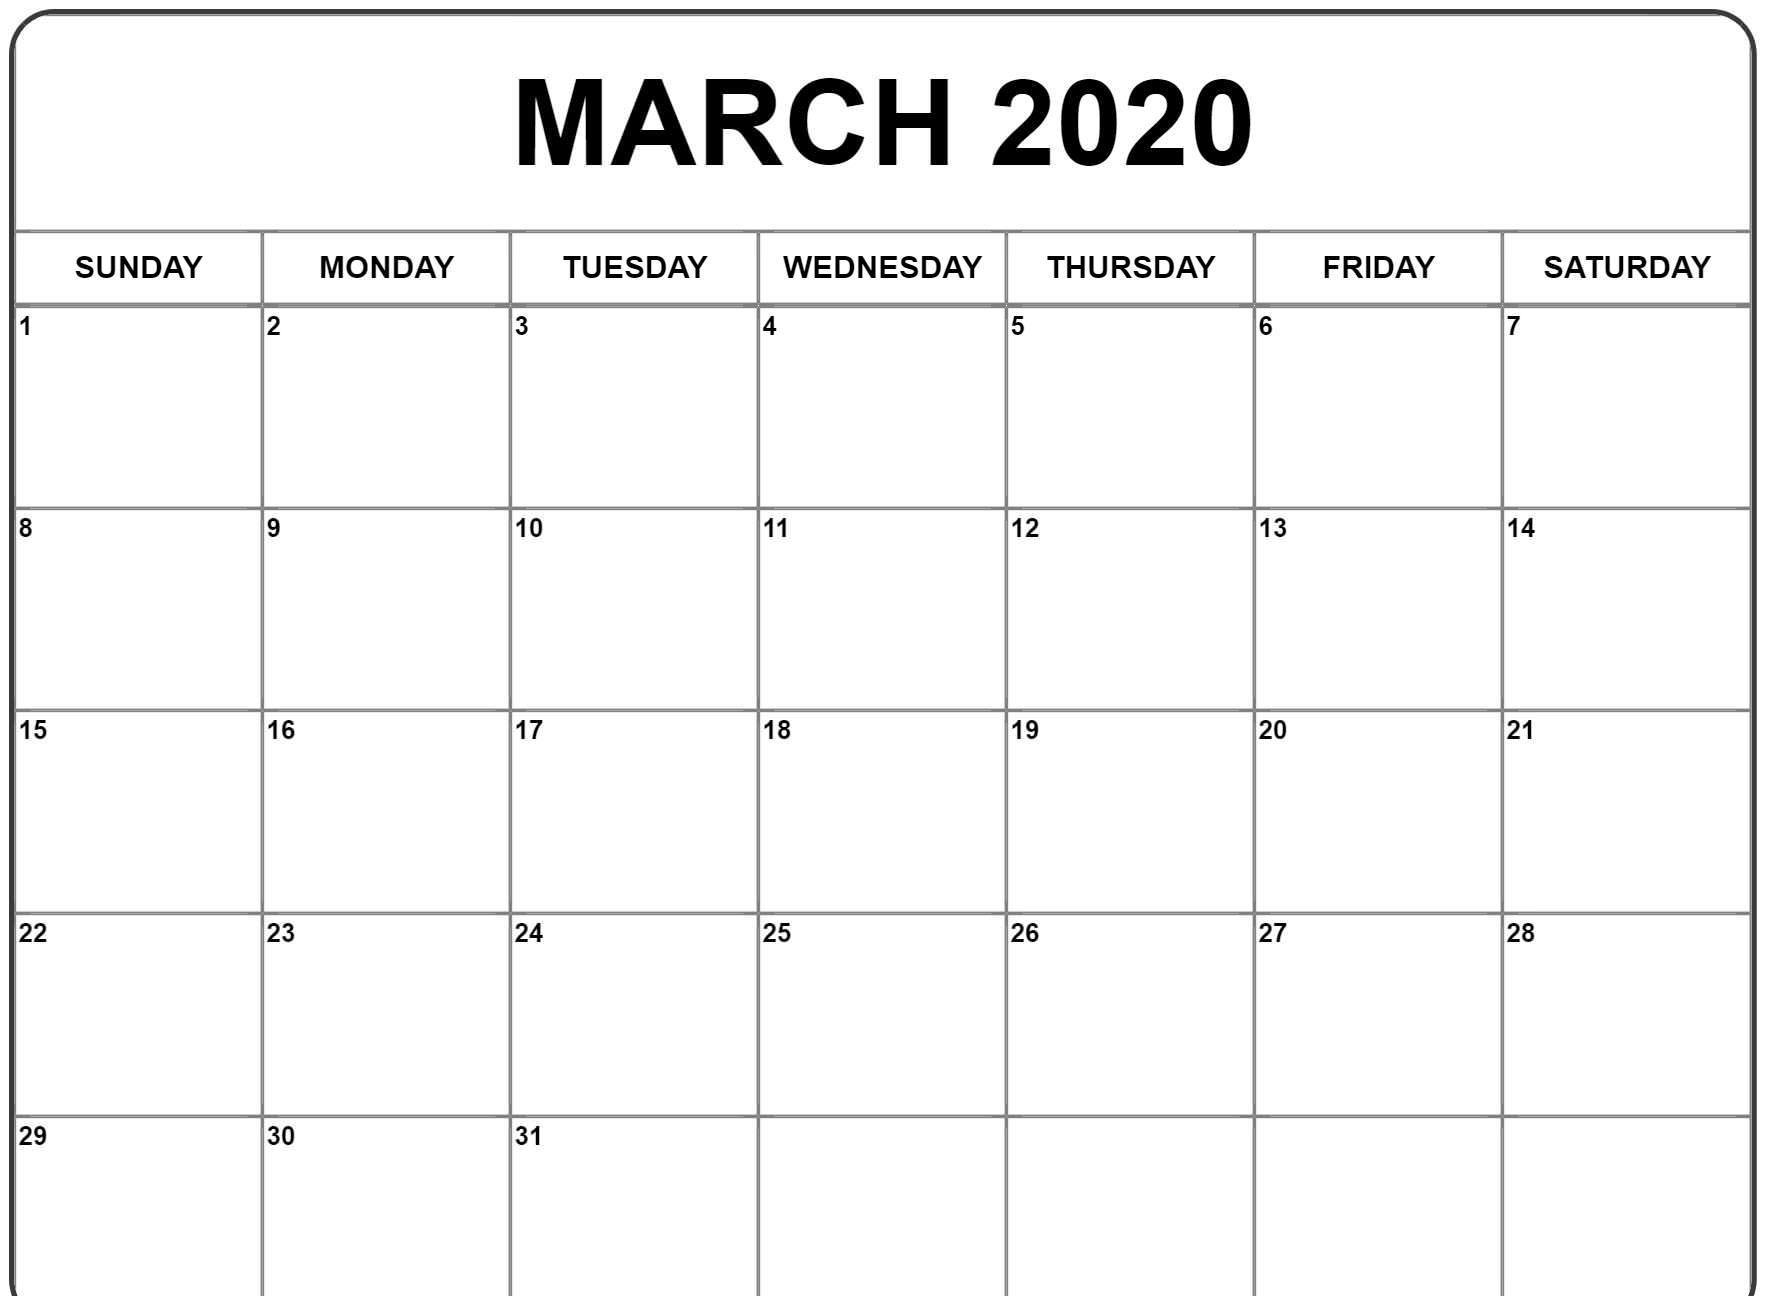 Free March 2020 Calendar Template